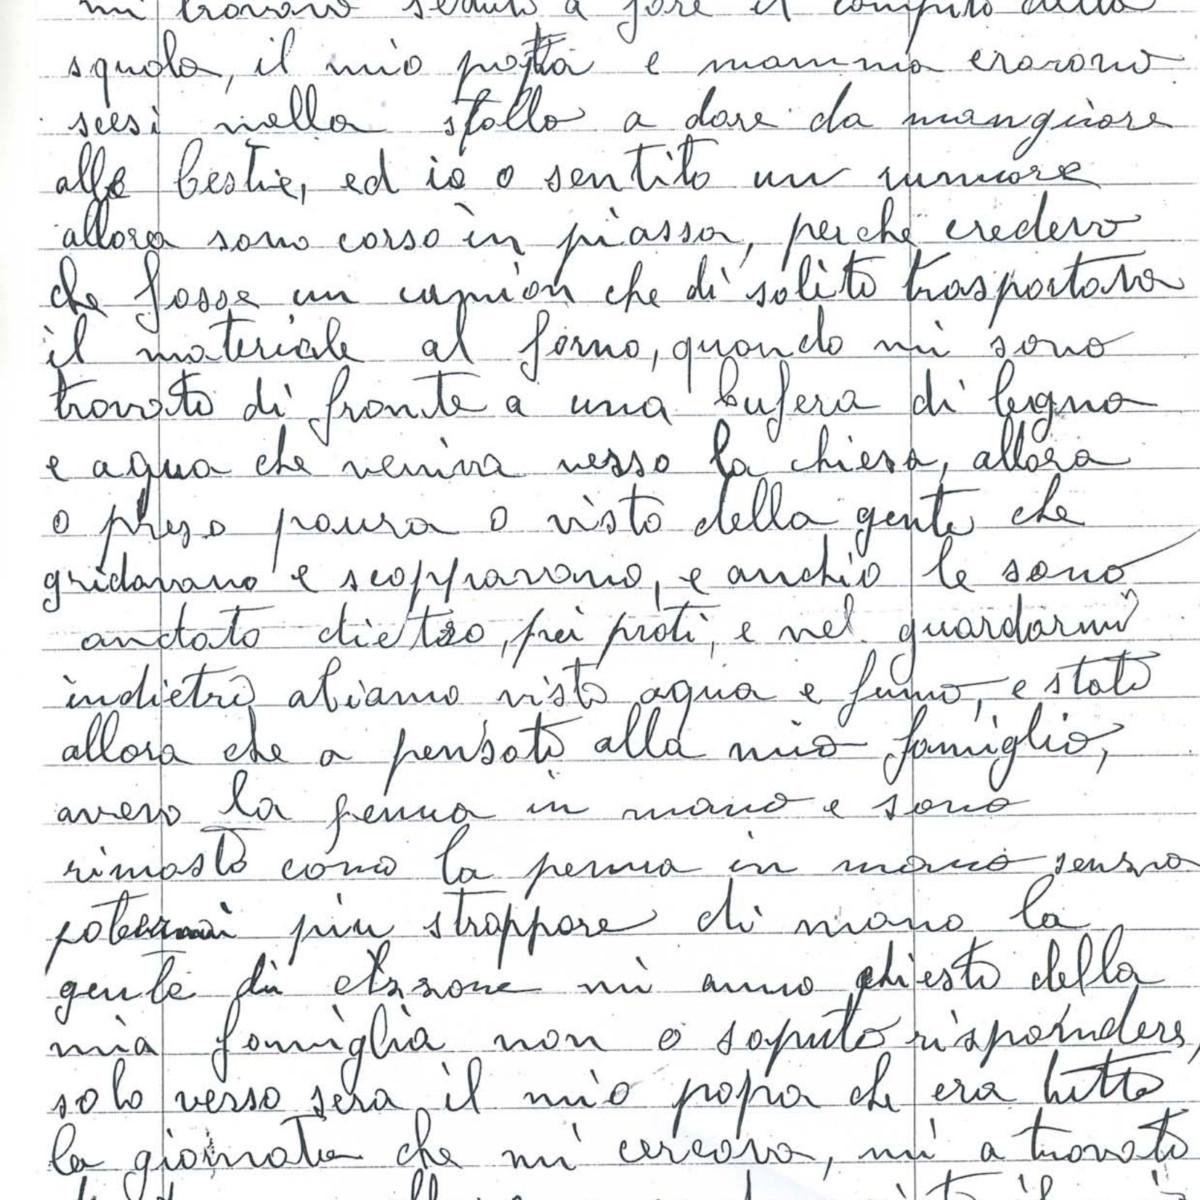 Lettera di Bettineschi Francesco